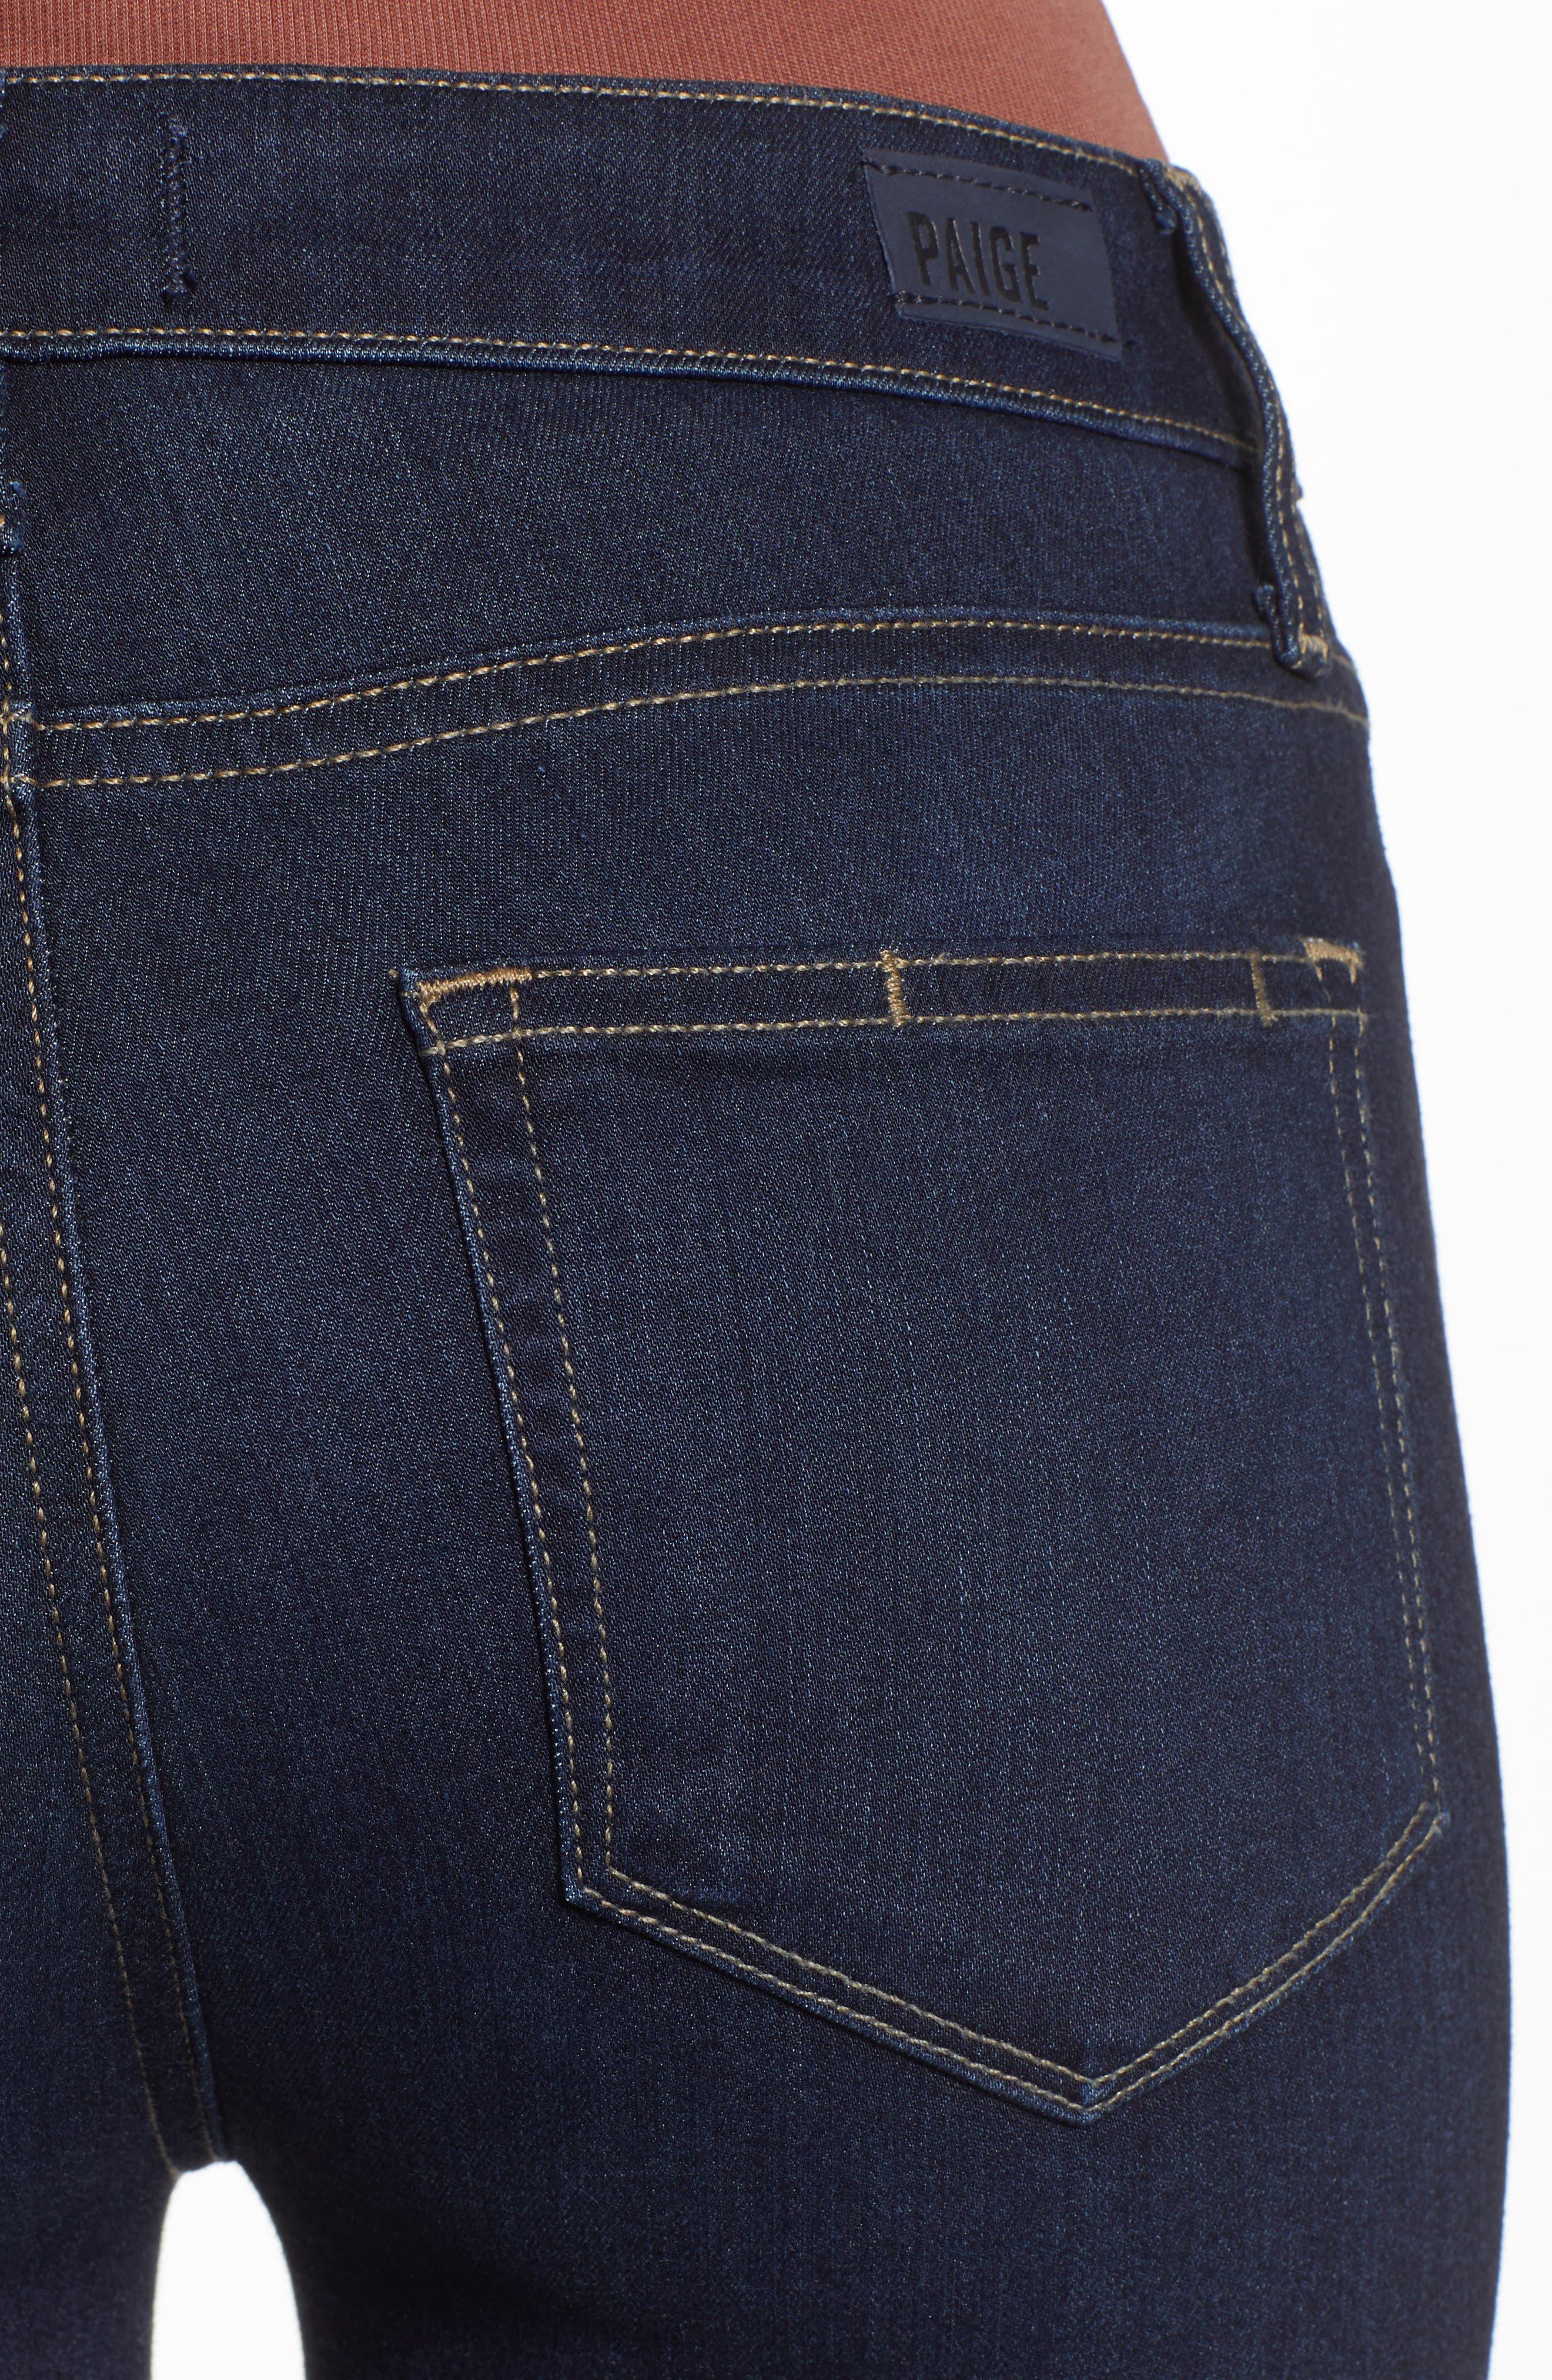 Transcend - Hoxton High Waist Ultra Skinny Jeans,                             Alternate thumbnail 4, color,                             SANIA